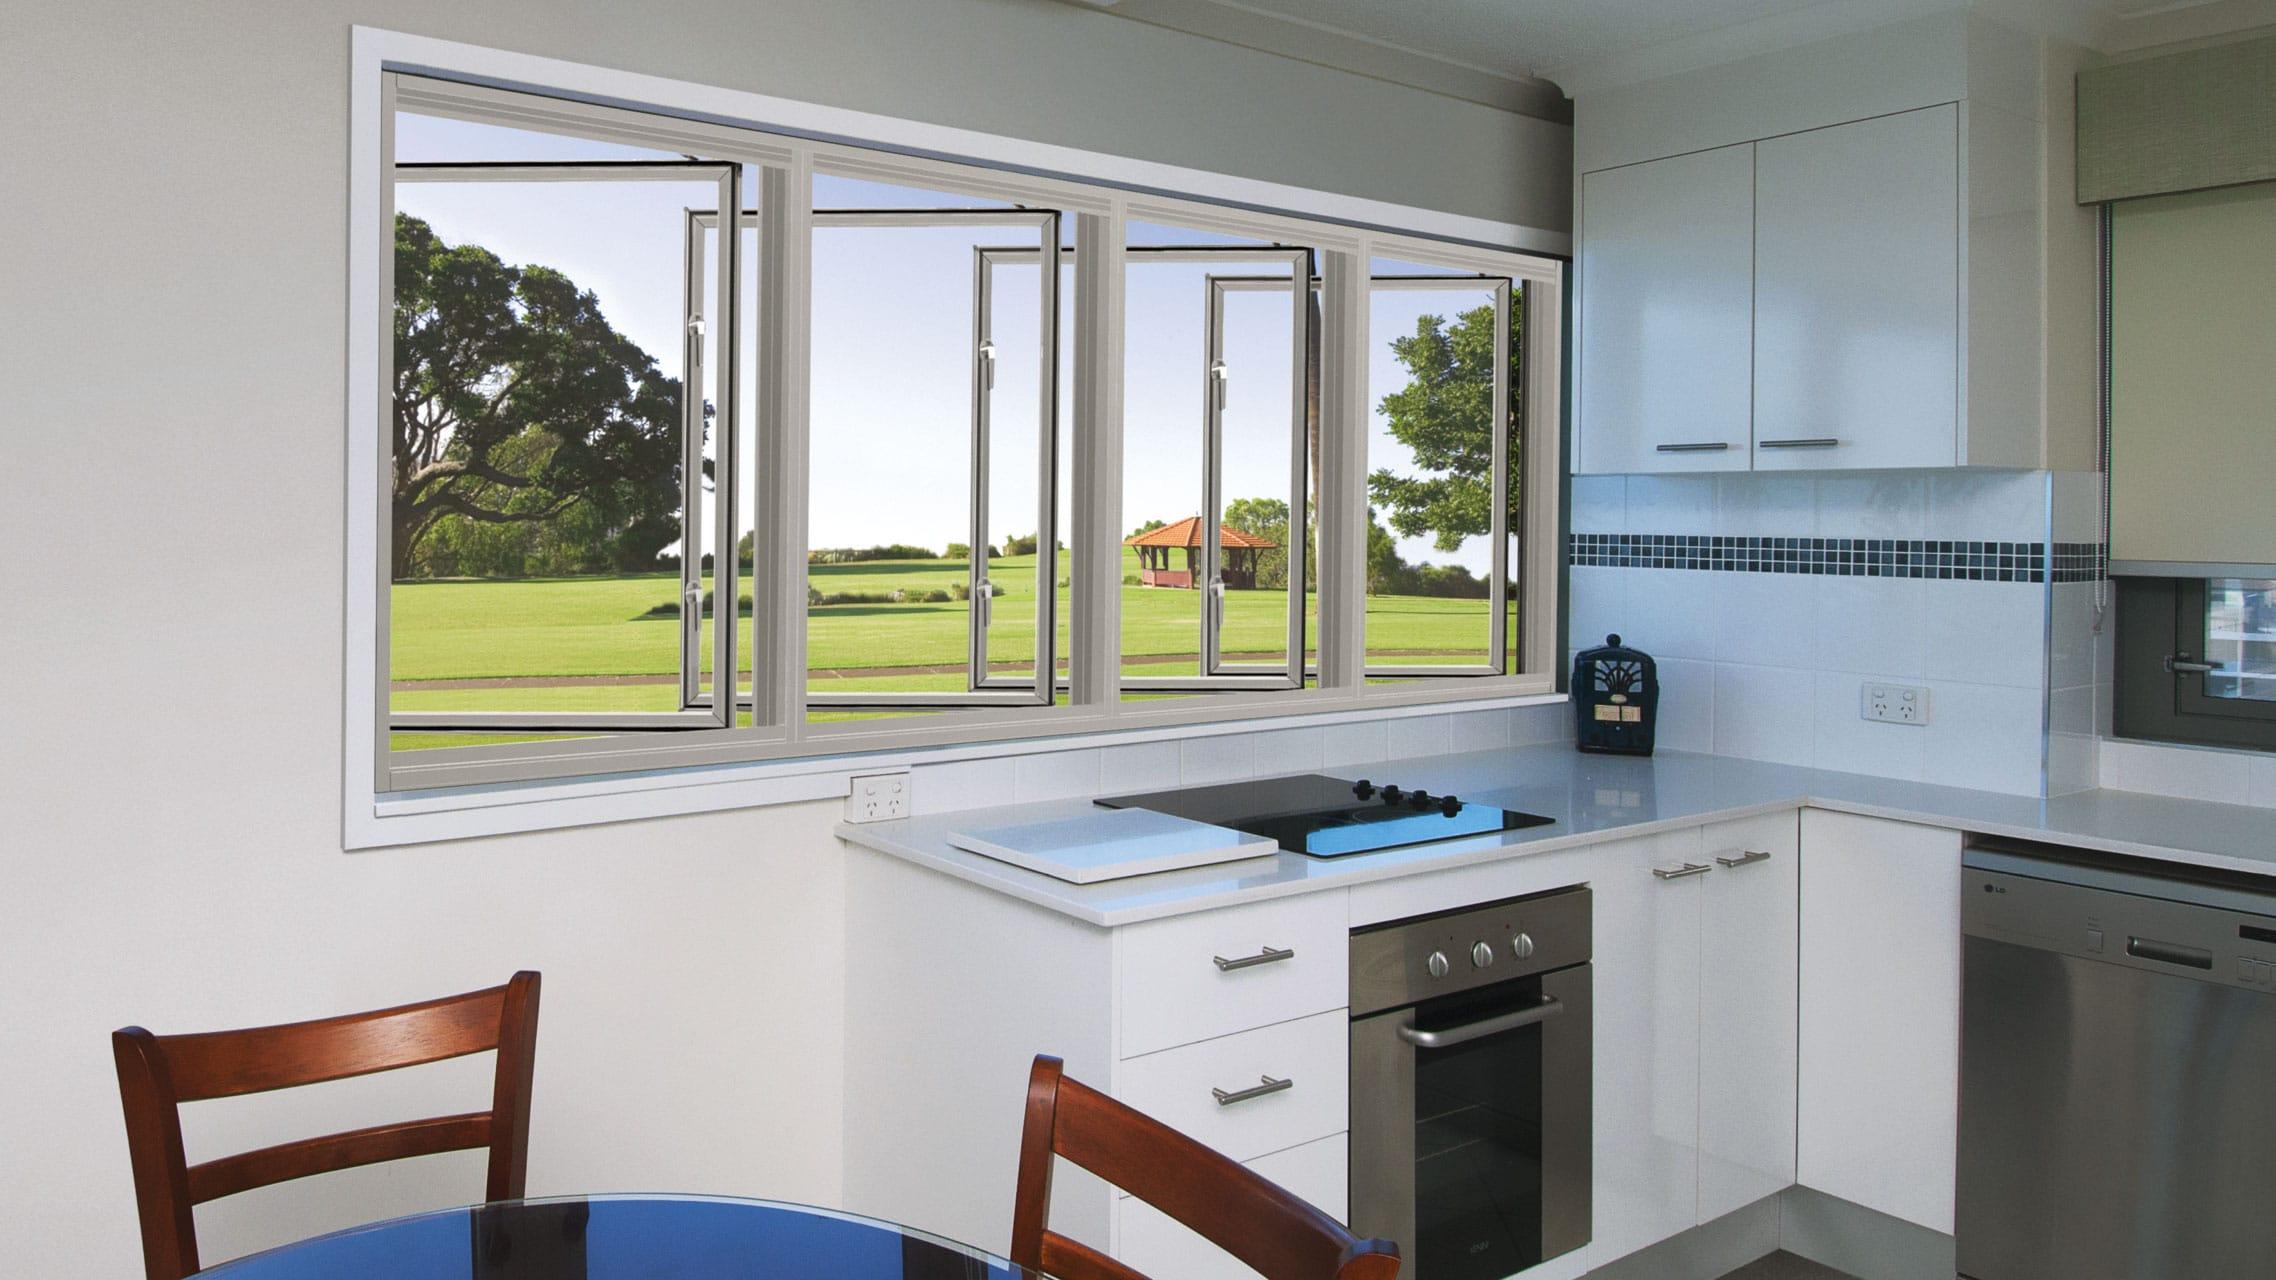 White Aluminium Casement Windows above a kitchen bench